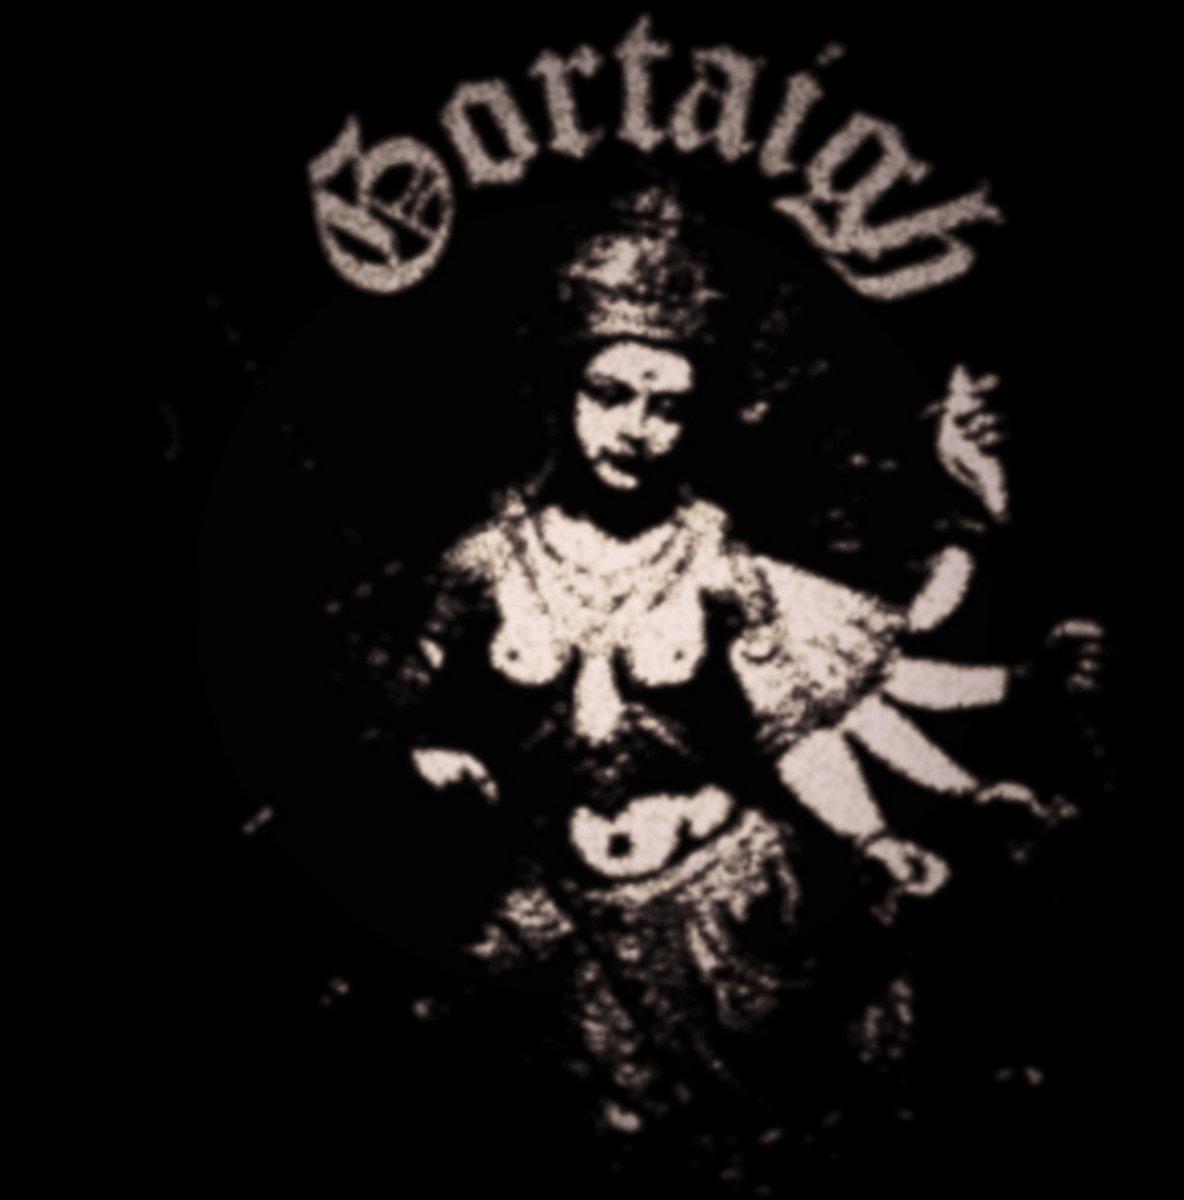 GORTAIGH - Svmmer Ov XXXX cover